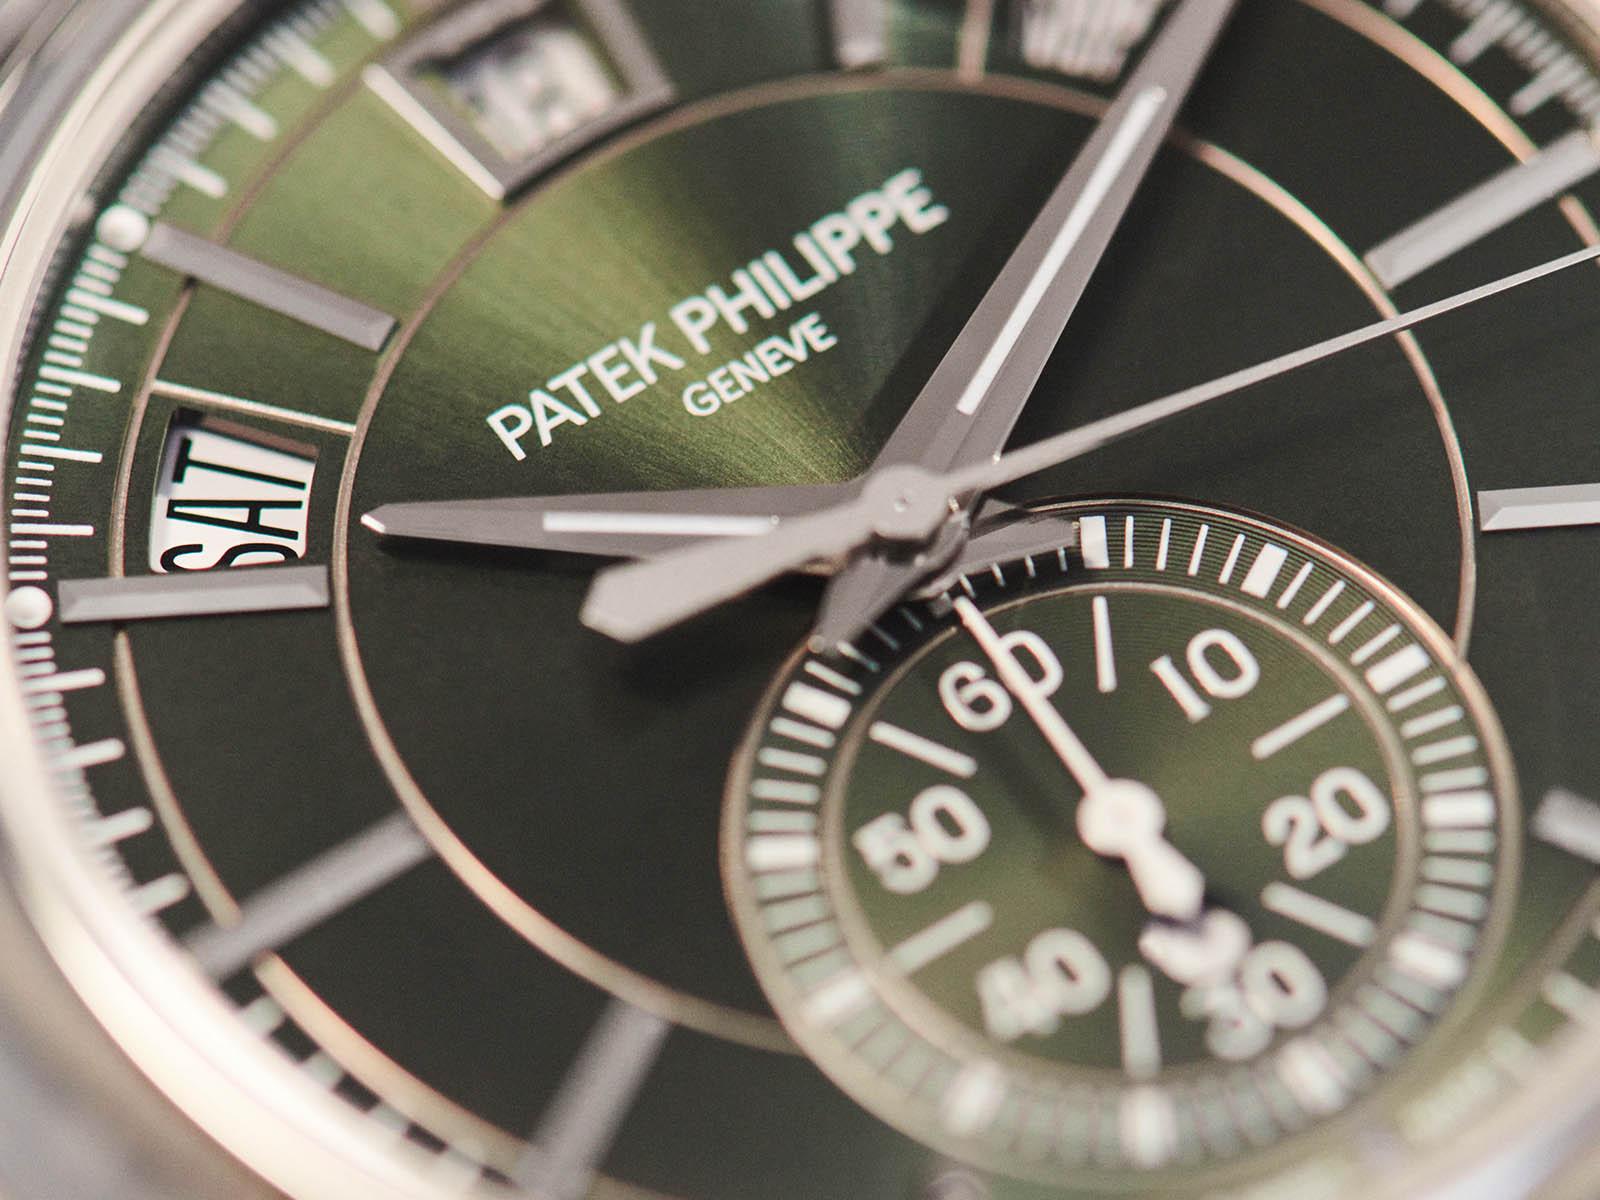 patek-philippe-5905-1a-001-2.jpg